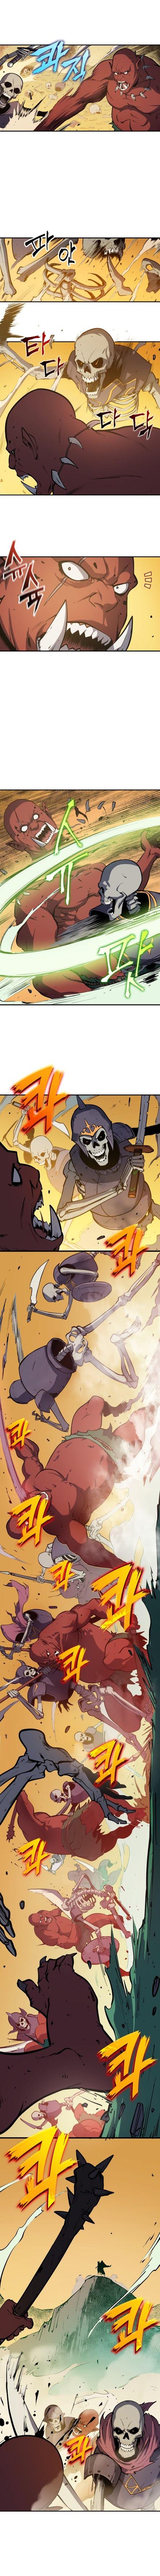 Max Level Returner - หน้า 8